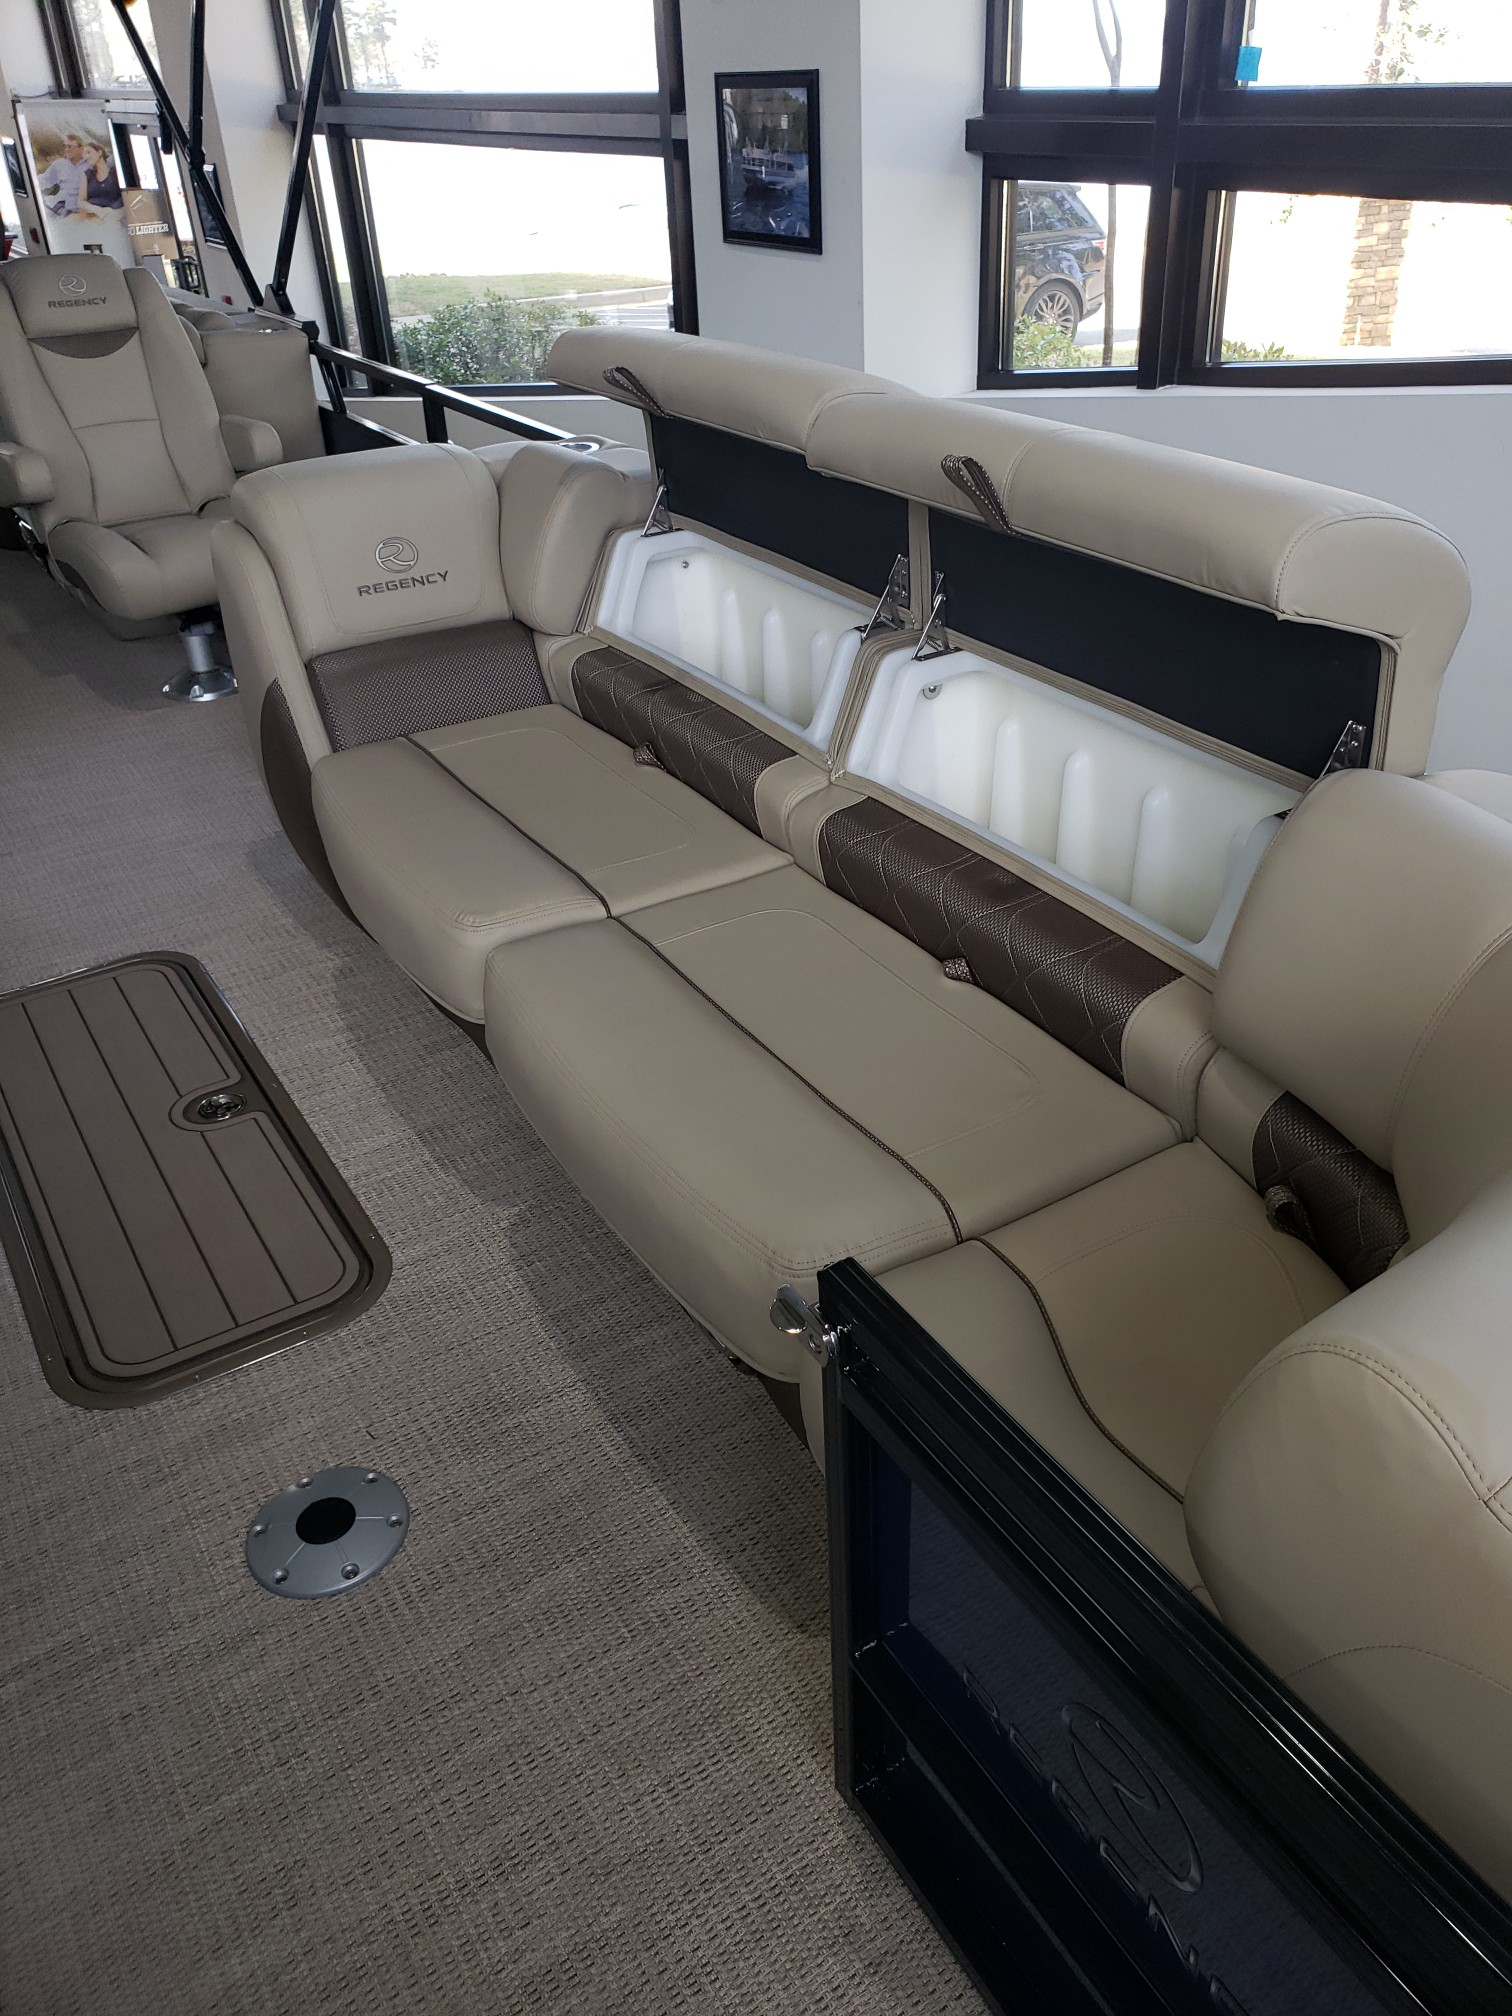 2020 Regency boat for sale, model of the boat is 250 LE3 w/300L Verado & Image # 23 of 27